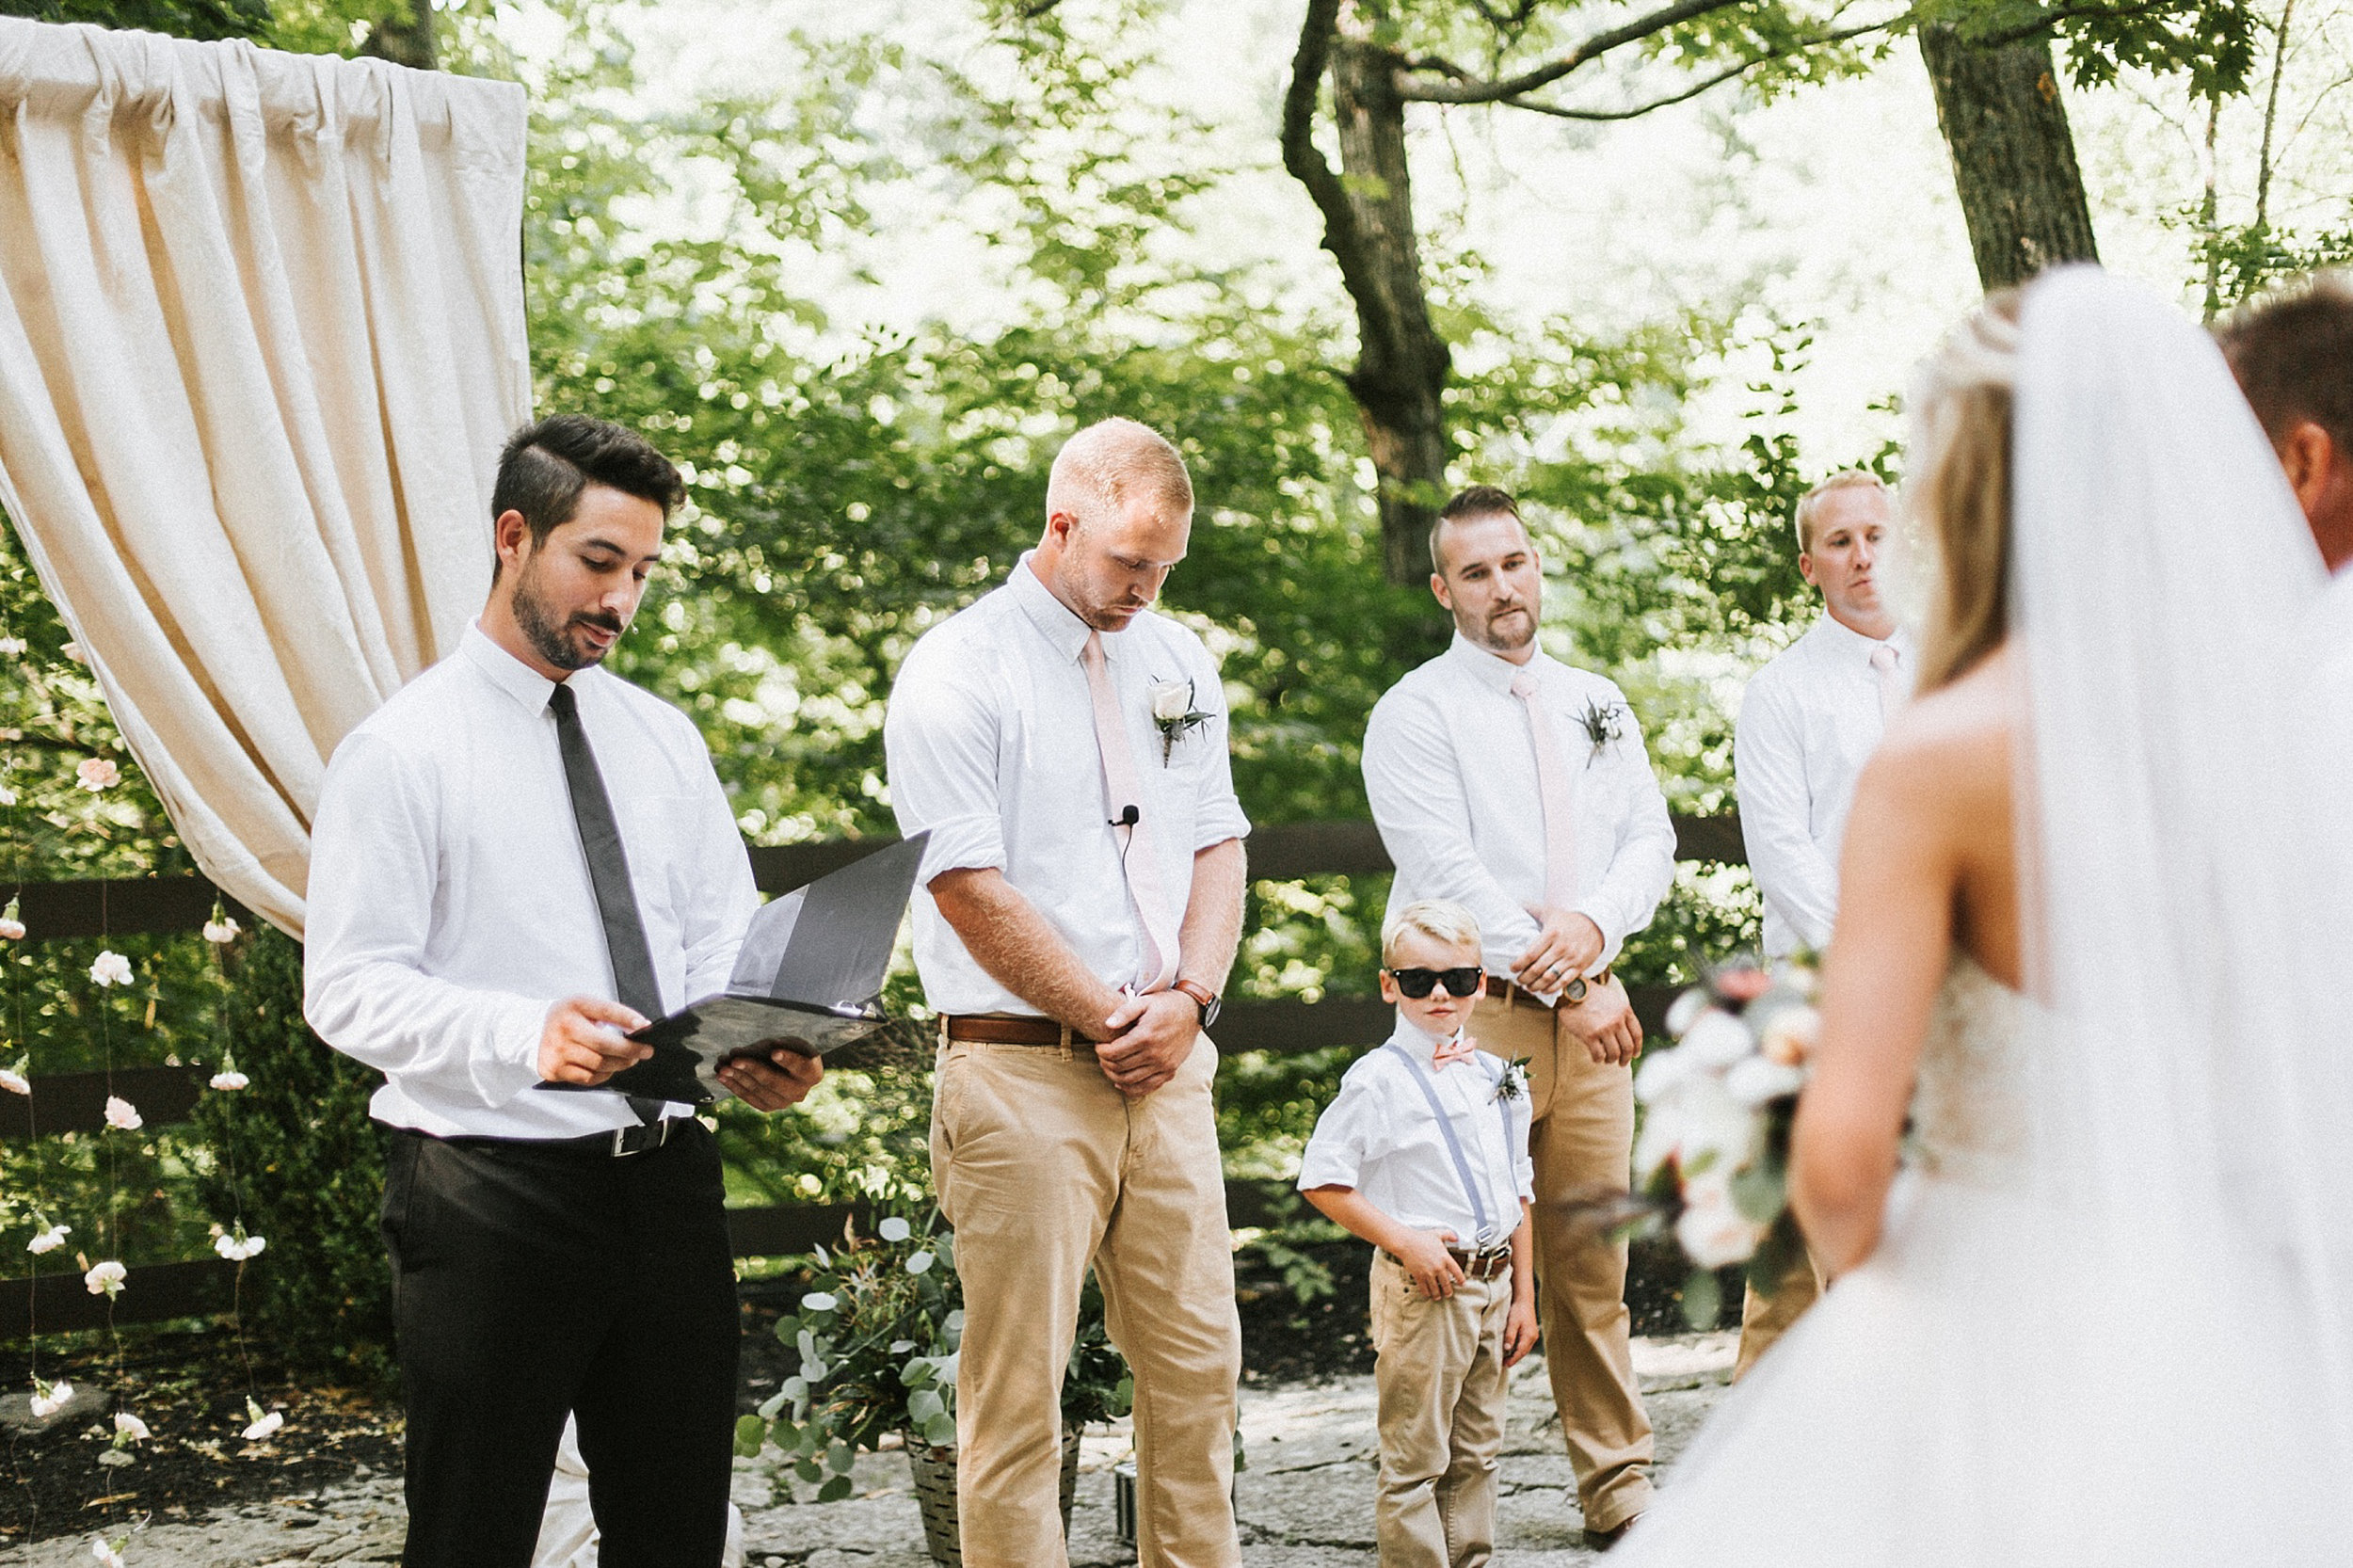 Brooke Townsend Photography - Cincinnati Wedding Photographer (69 of 153).jpg